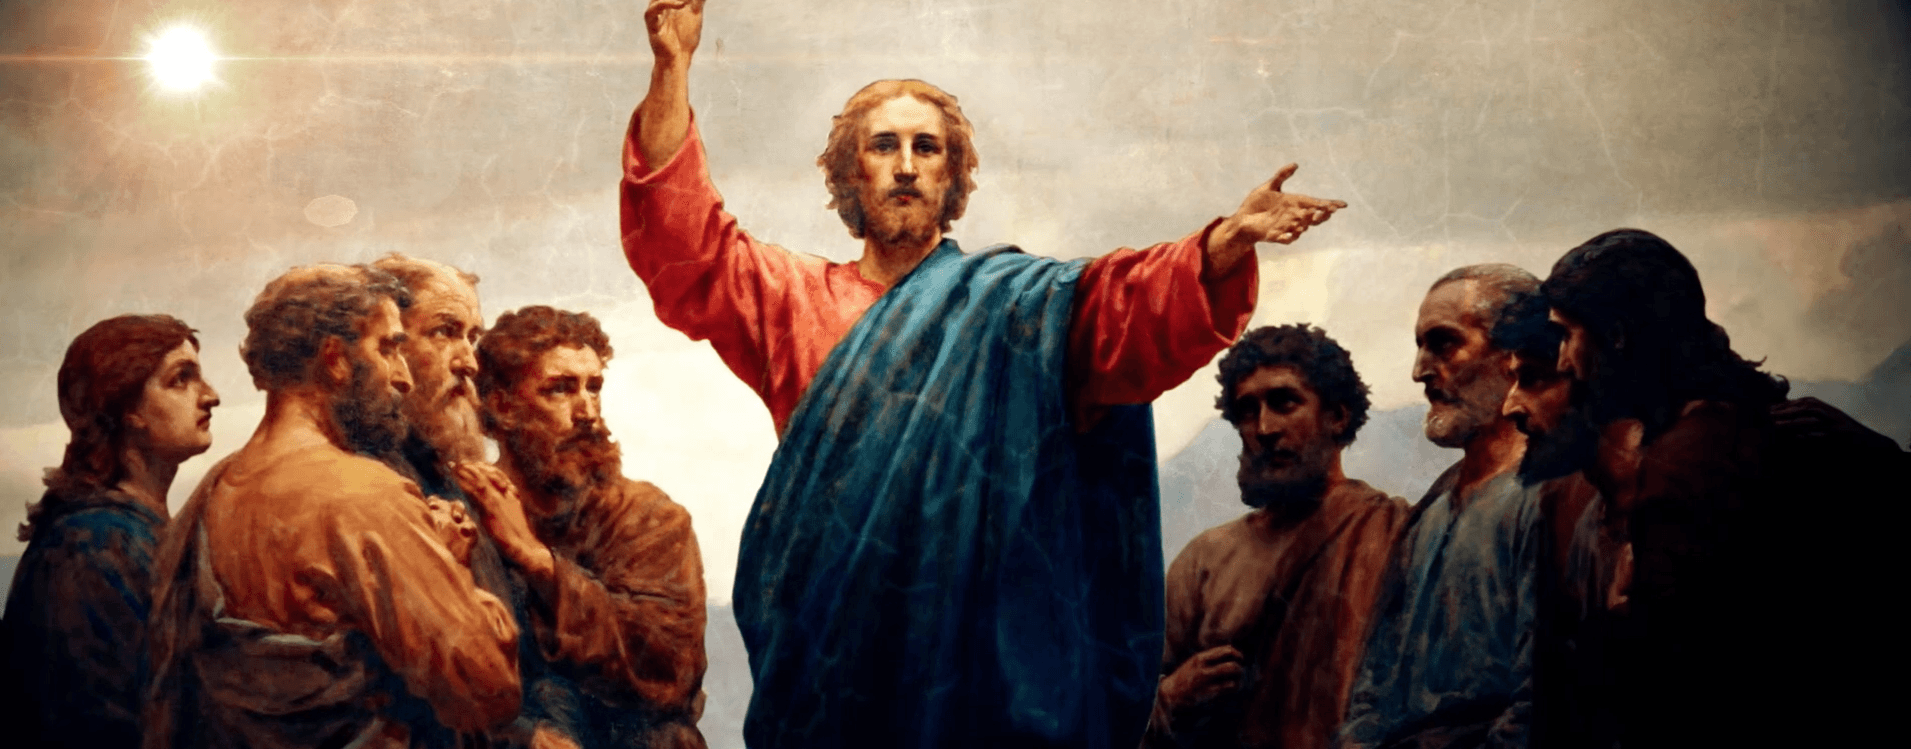 об апостолов картинки